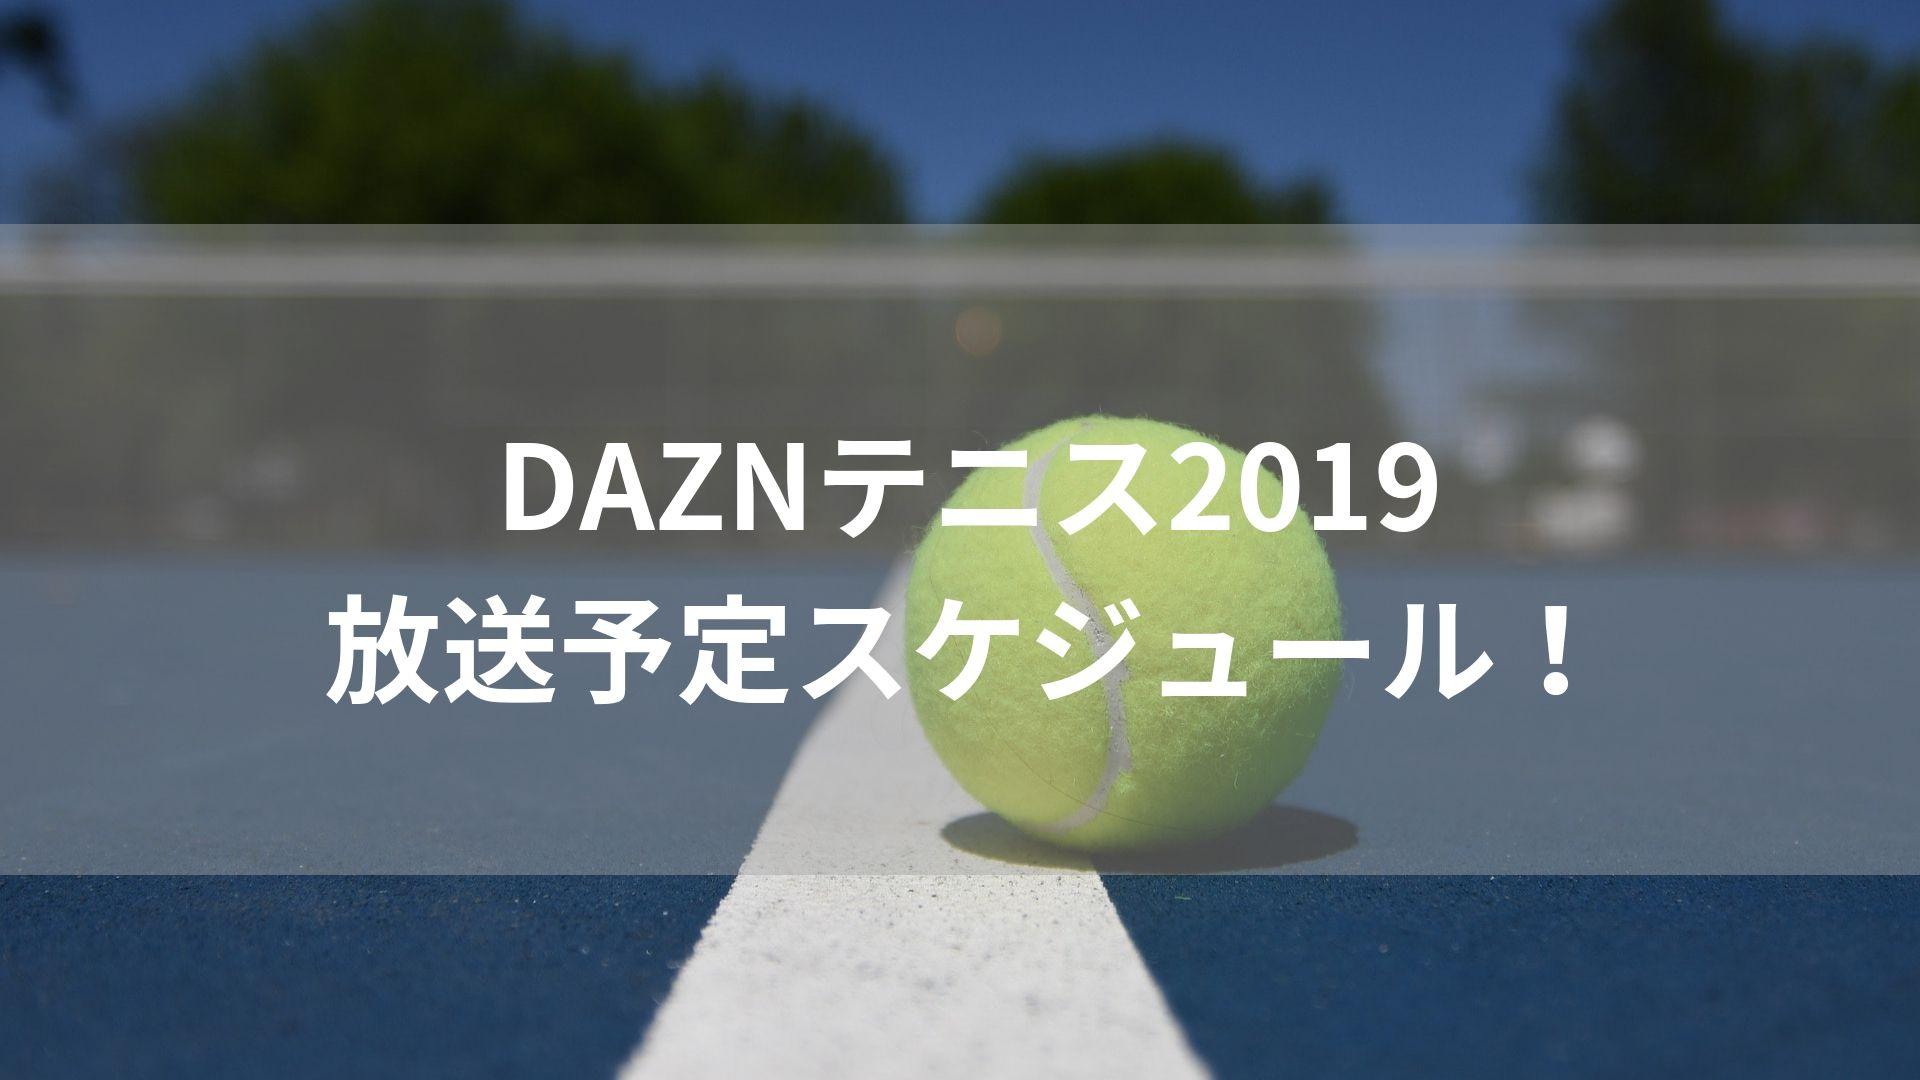 DAZNテニス2019放送予定スケジュール